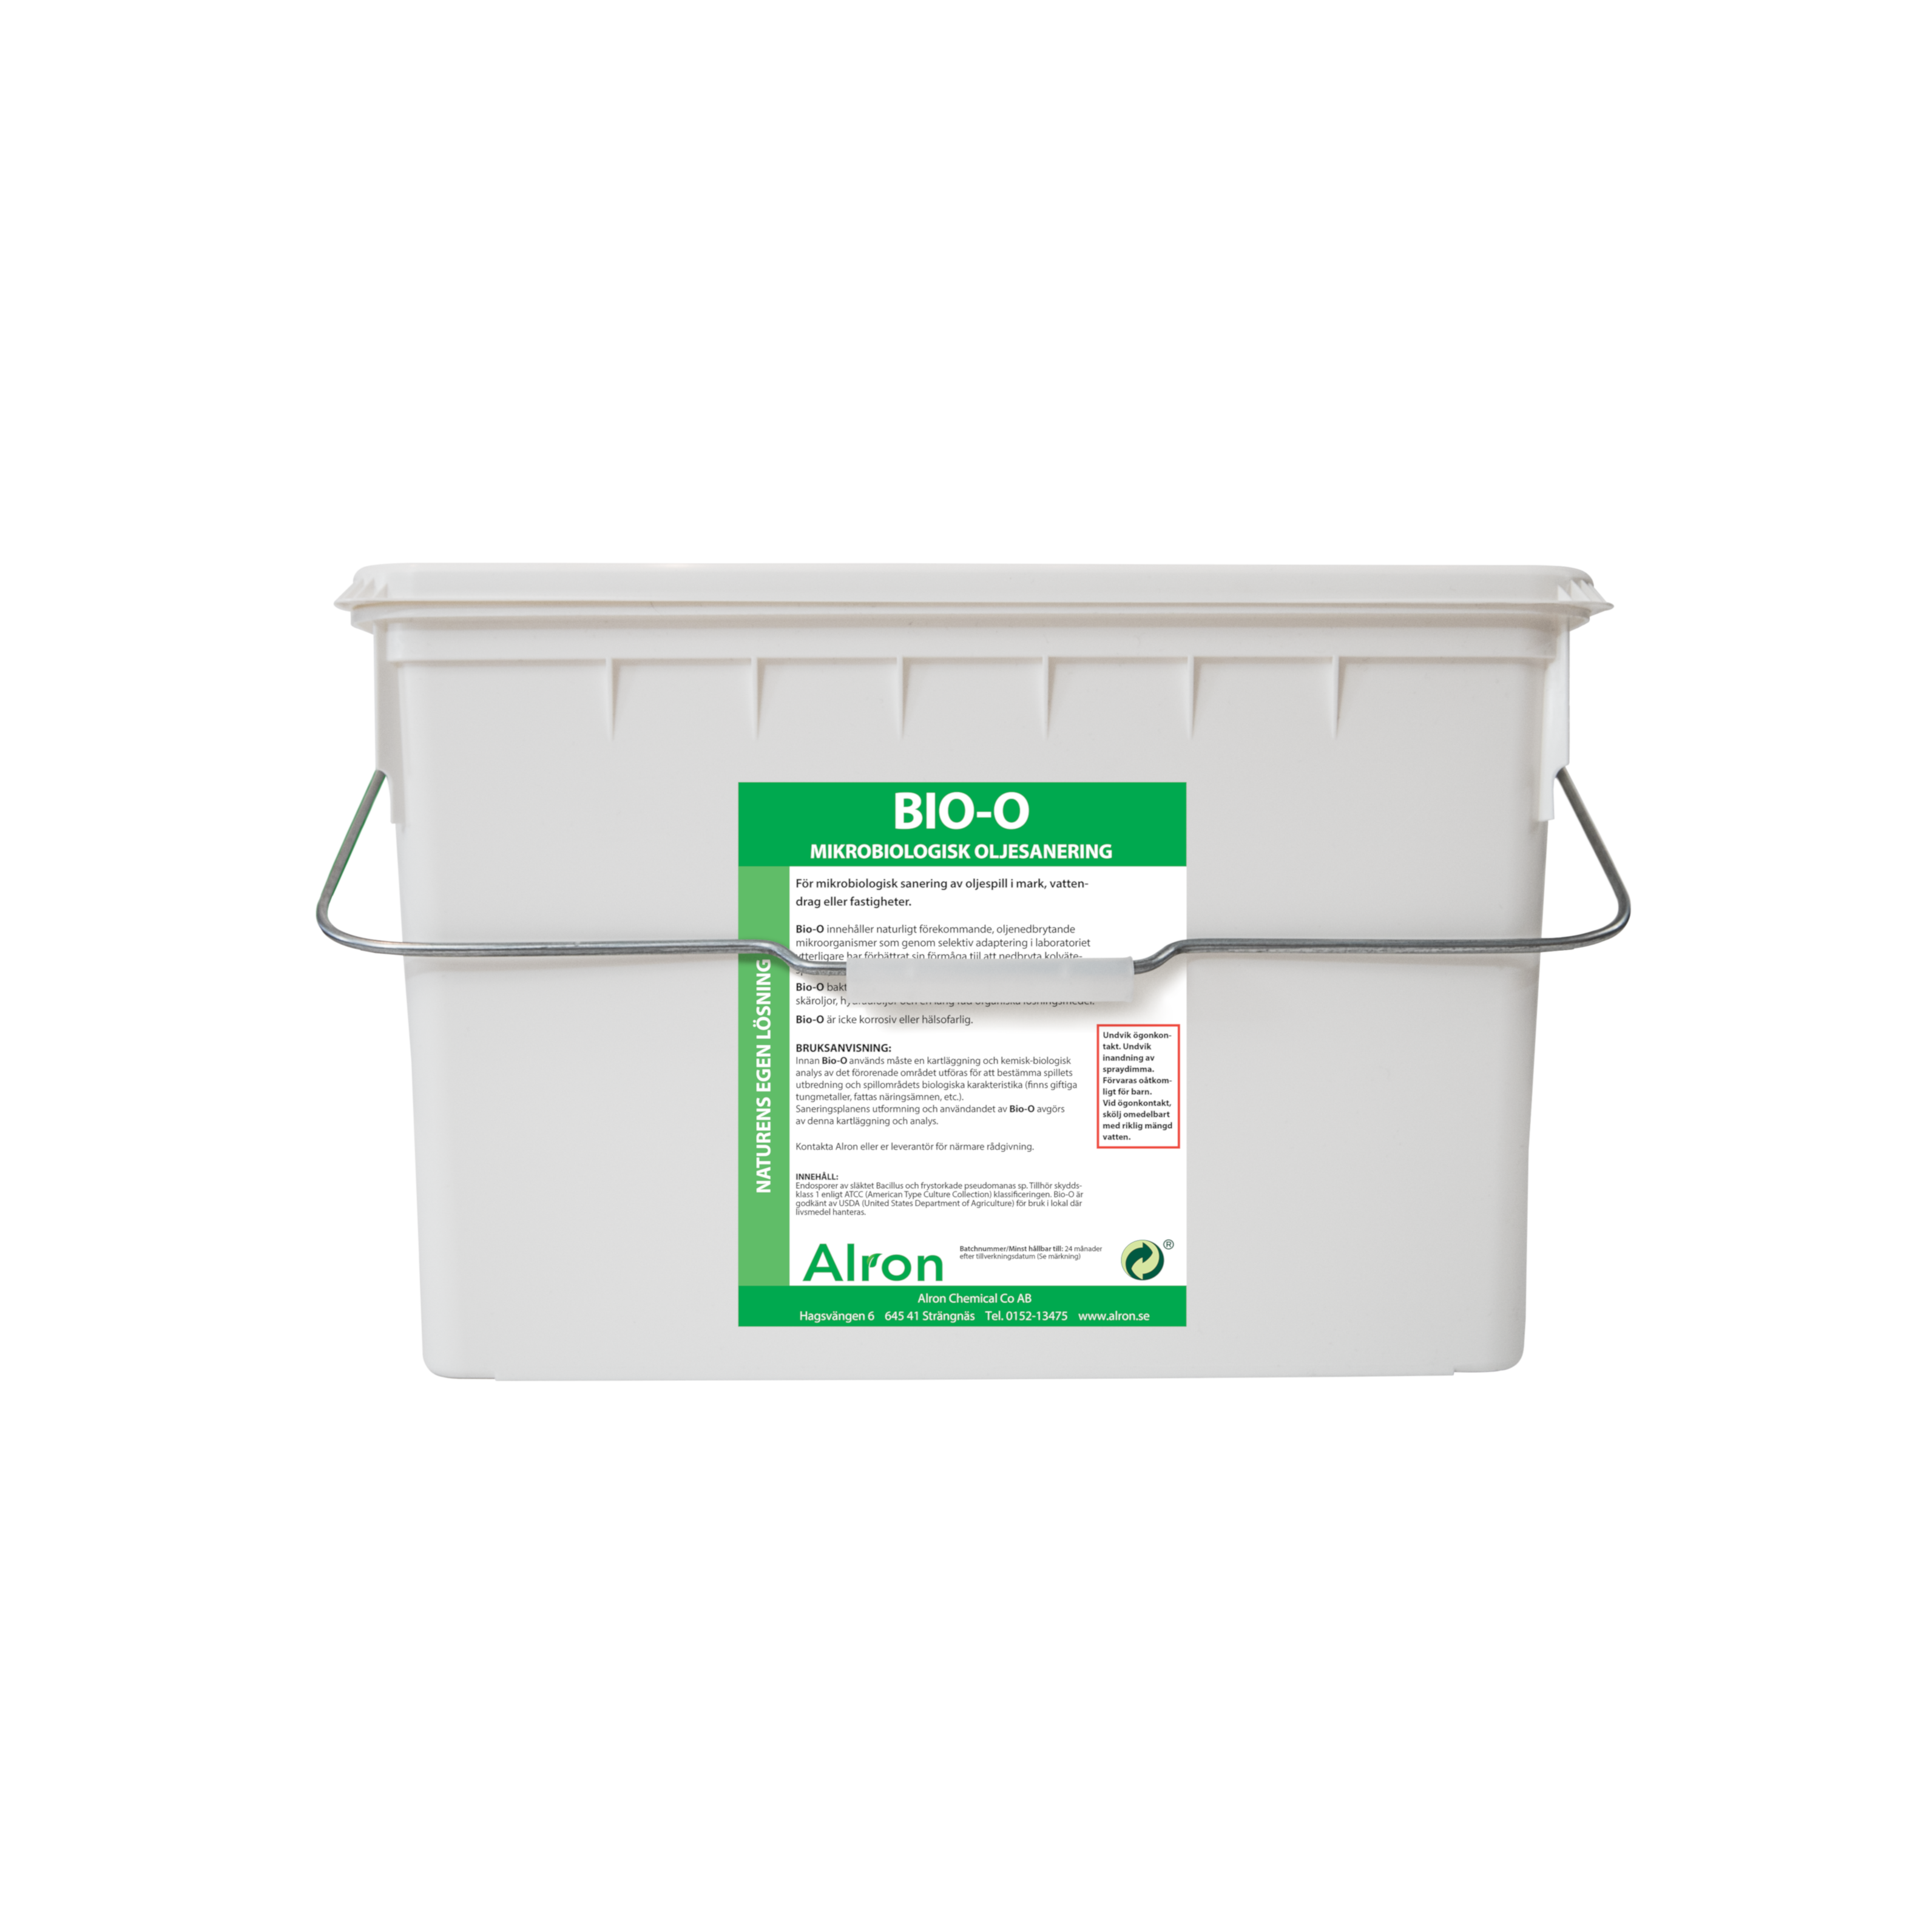 Bio-O-Oljesaneringspaket1